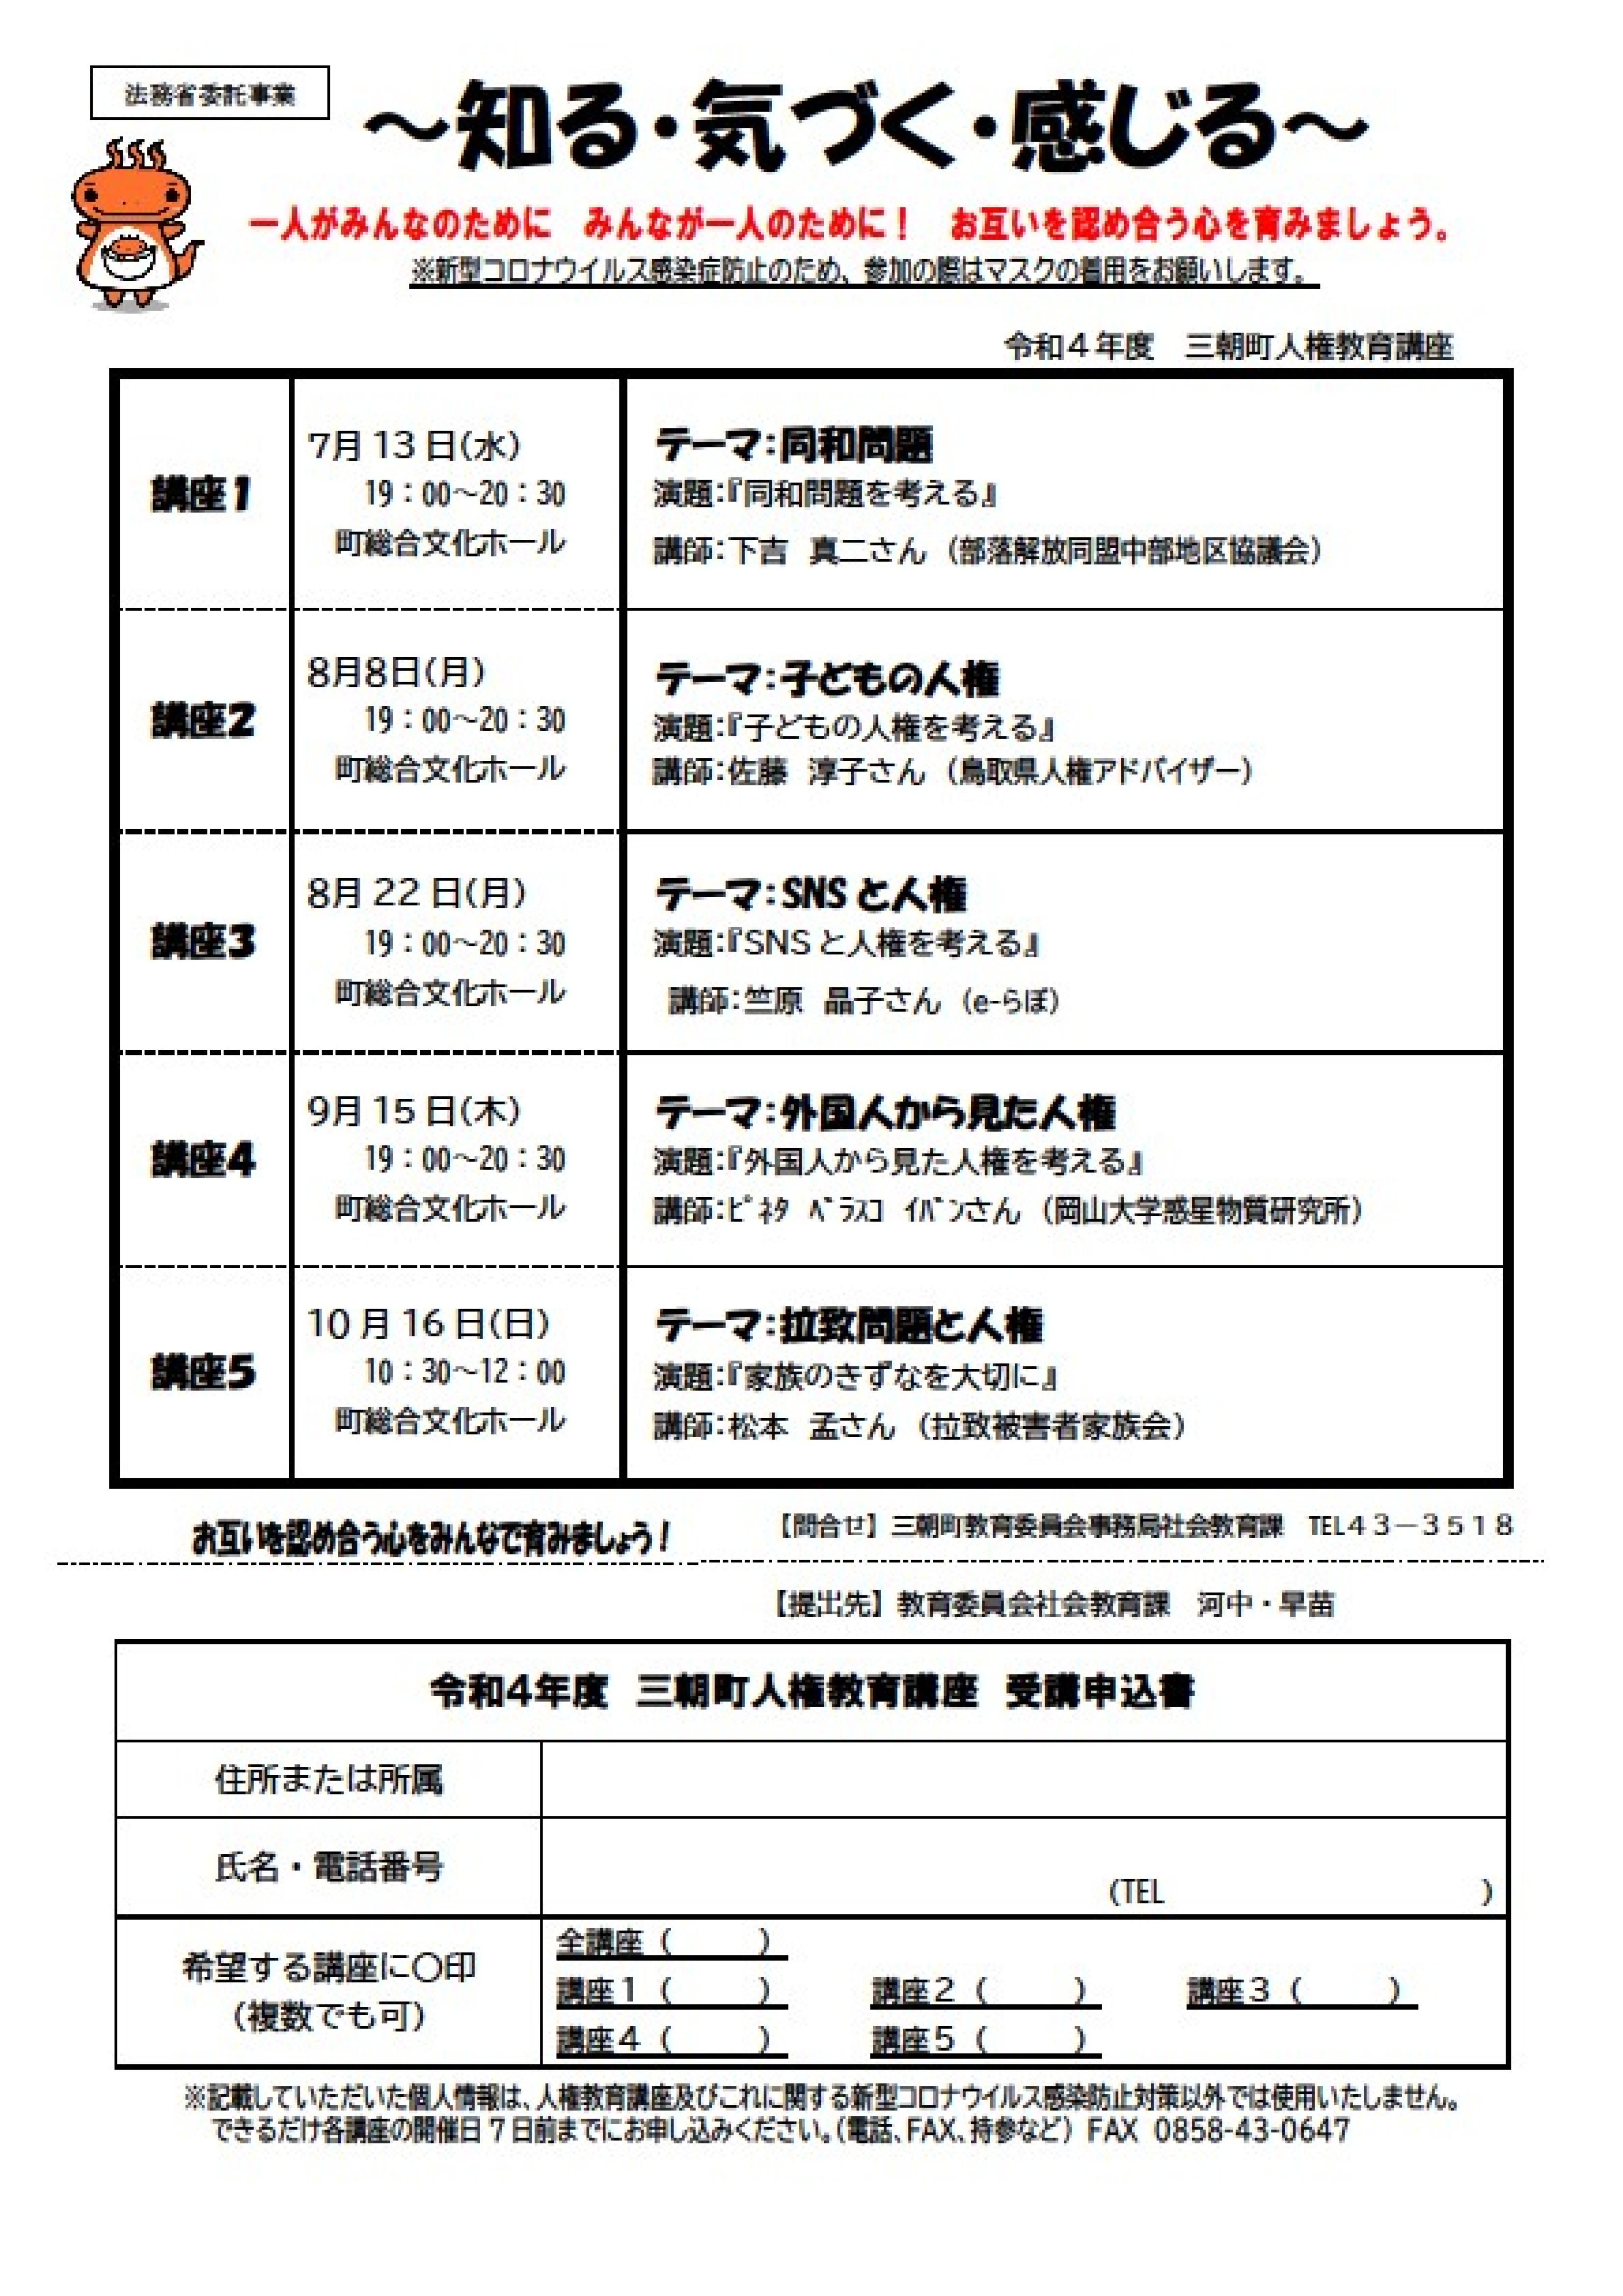 R3人権教育講座チラシ(裏)